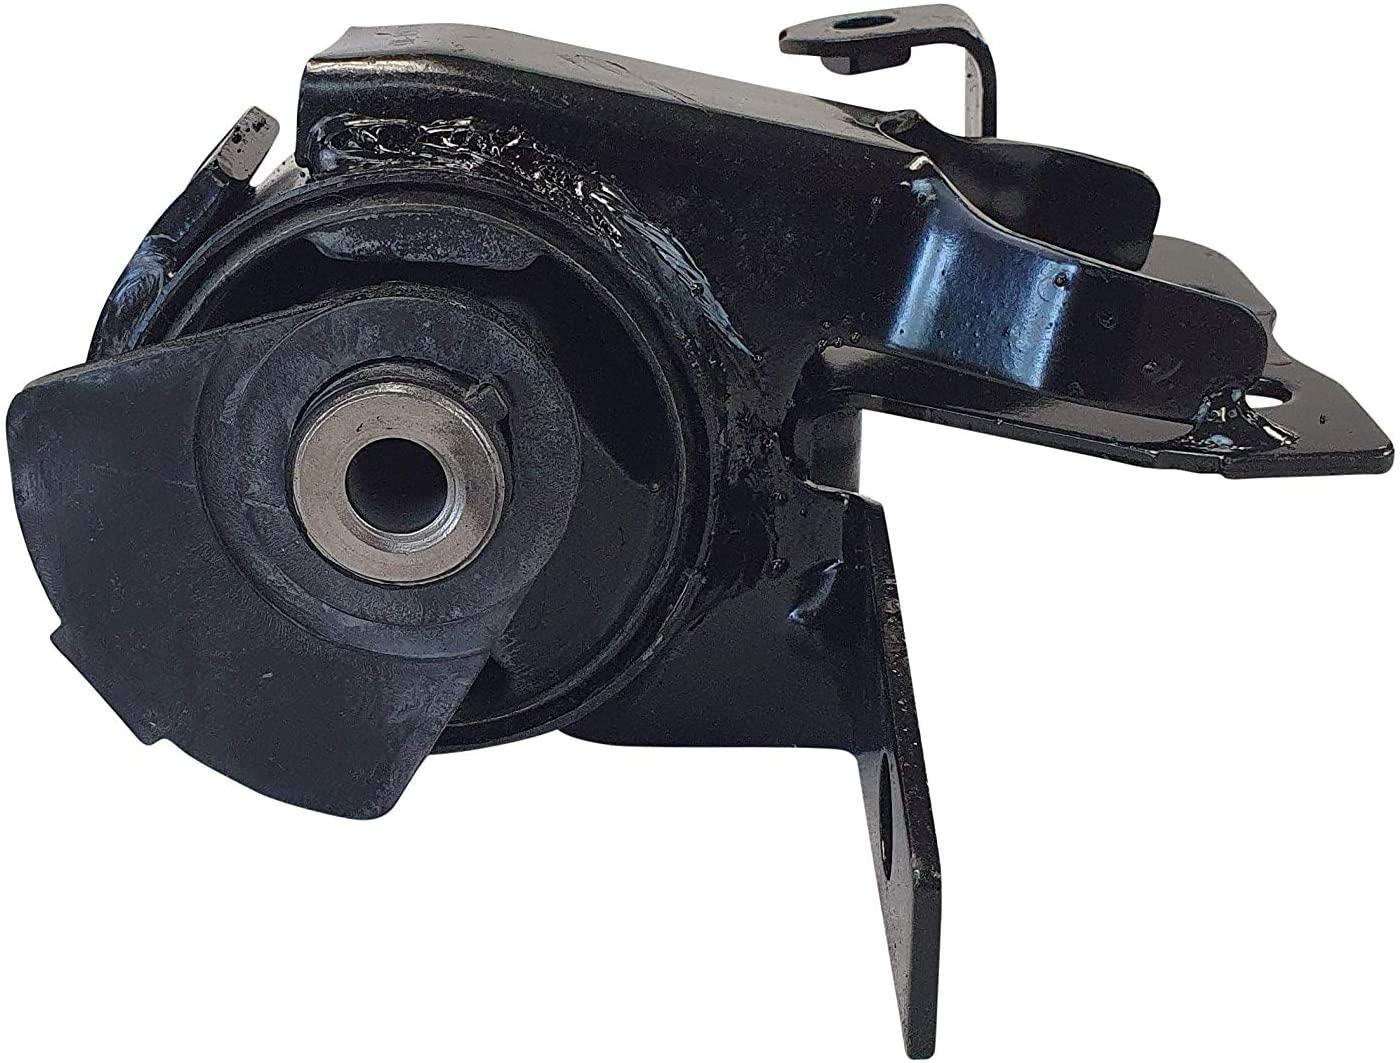 Automotive Aftermarket, Automatic Transmission Mount, compatible with Part Numbers 8978, A6464, EM-8978 (4M-8978)